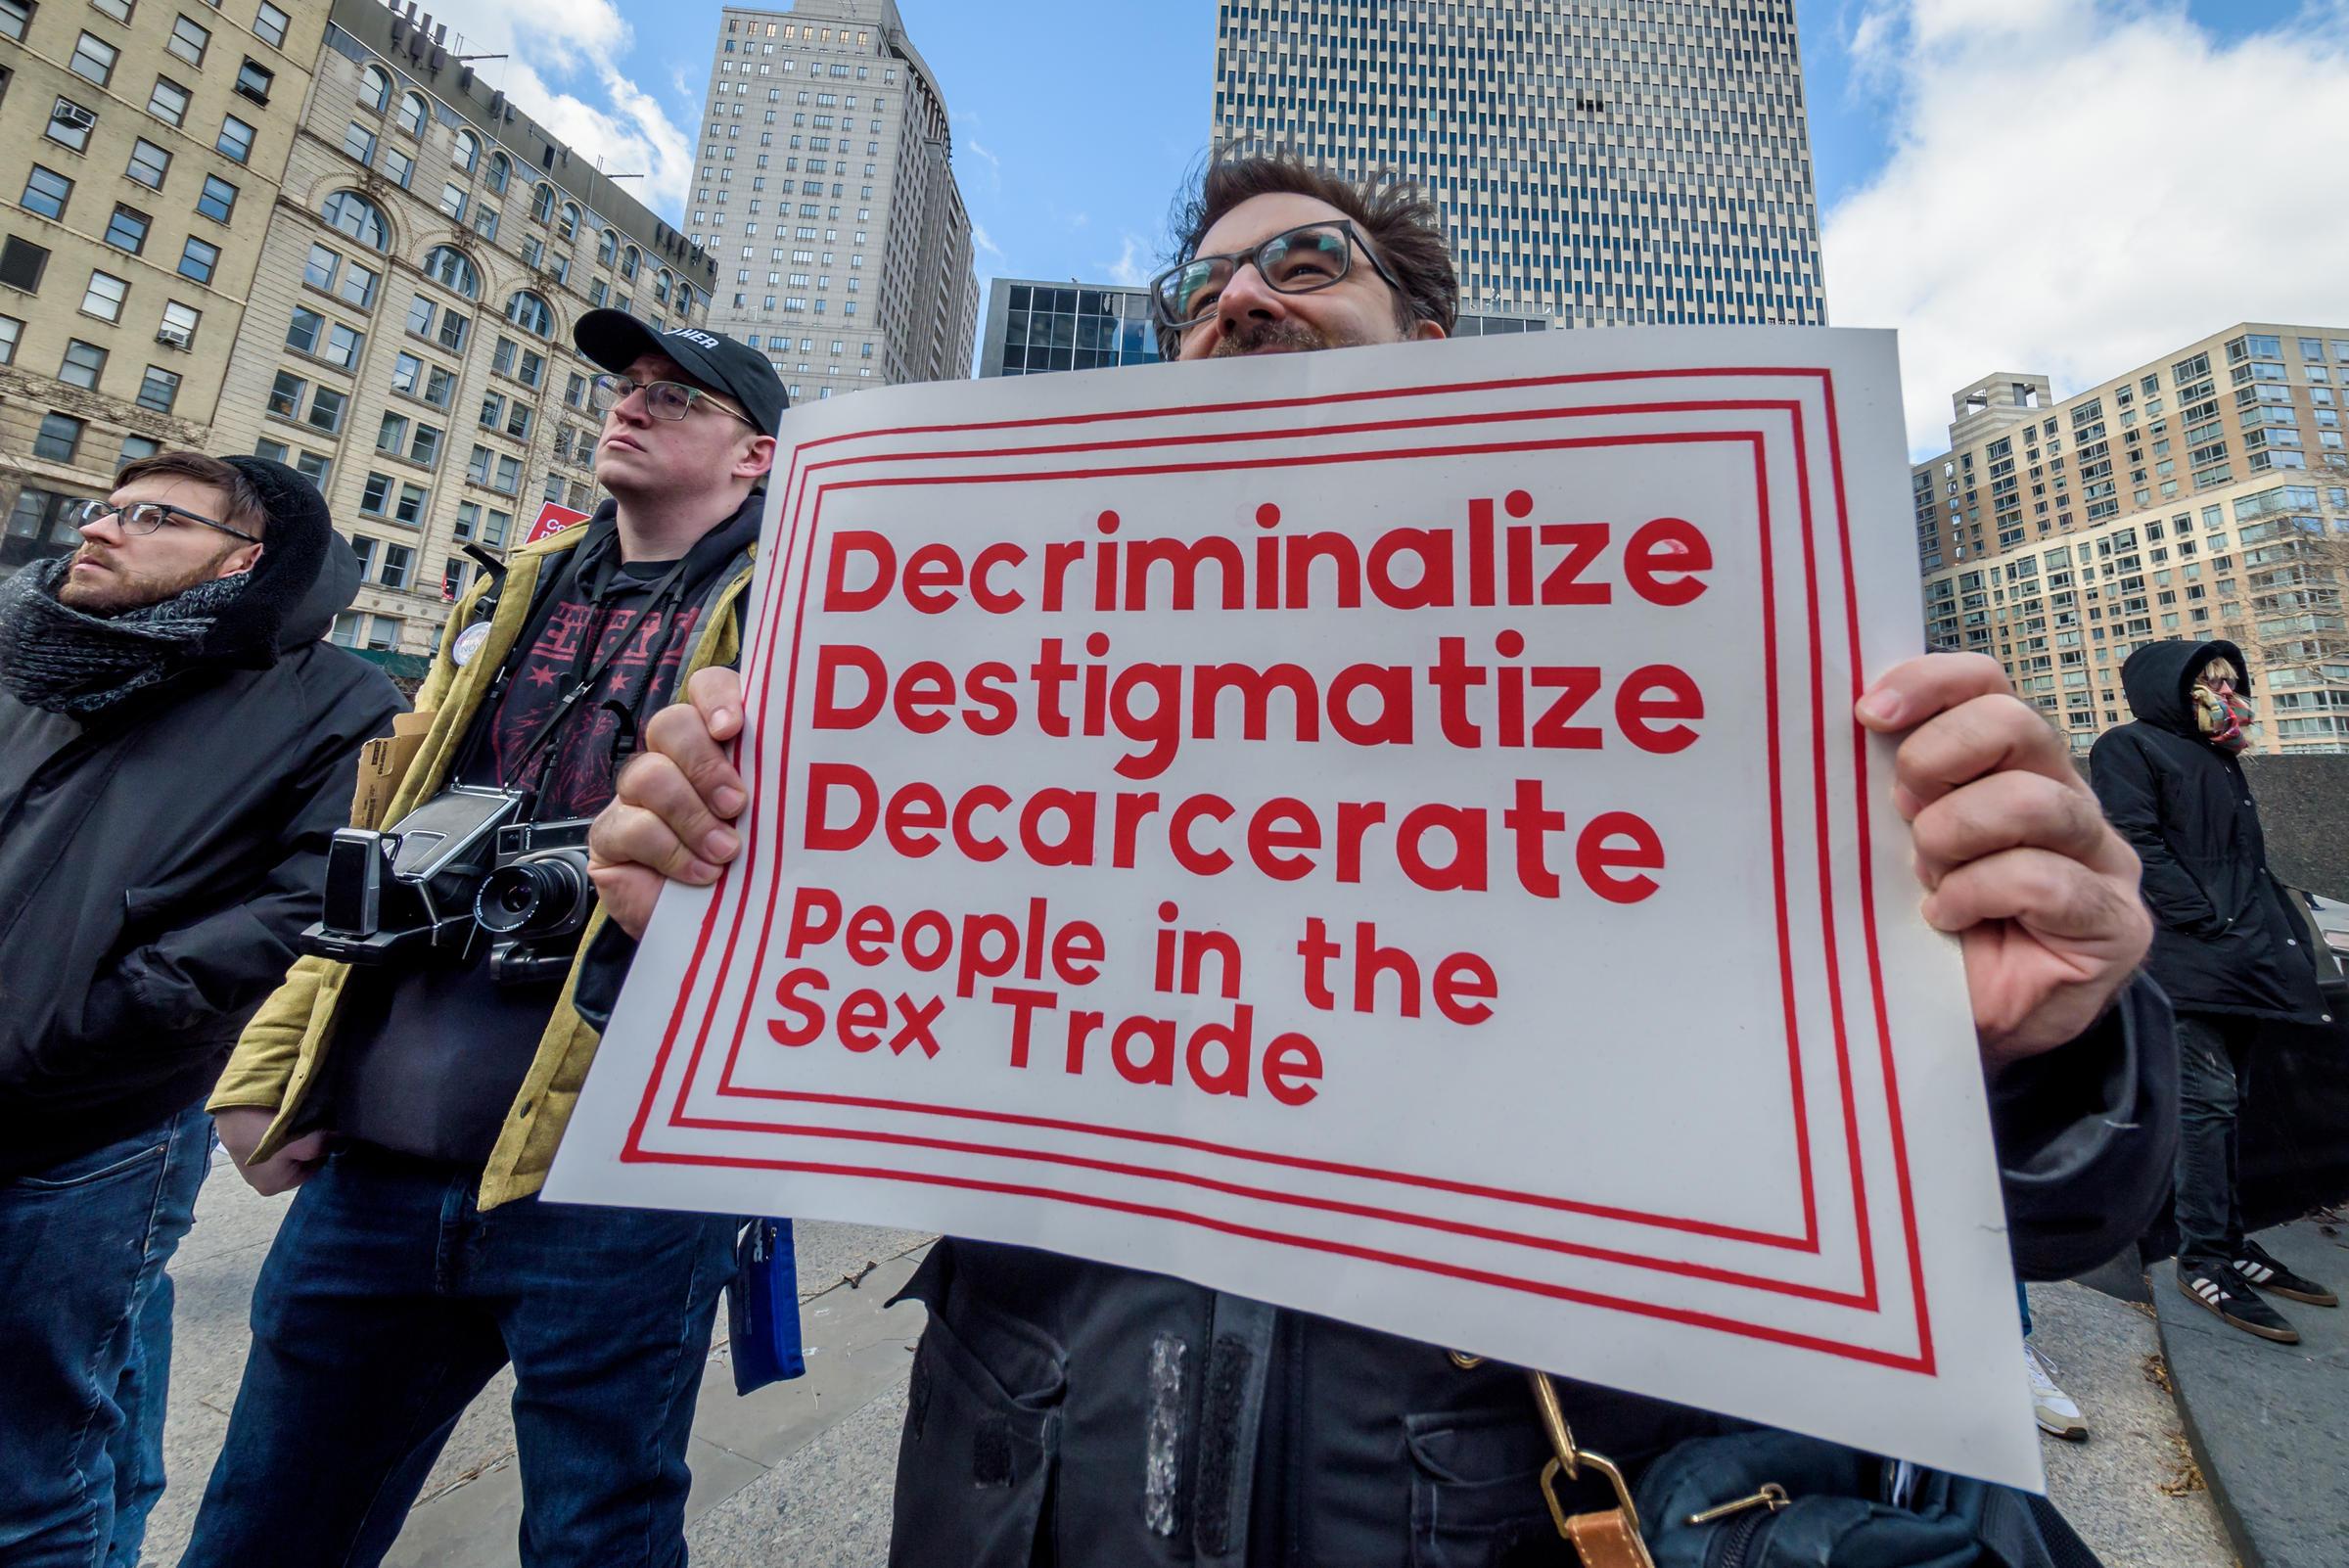 Should Sex Work Be Decriminalized? Some Activists Say It's Time